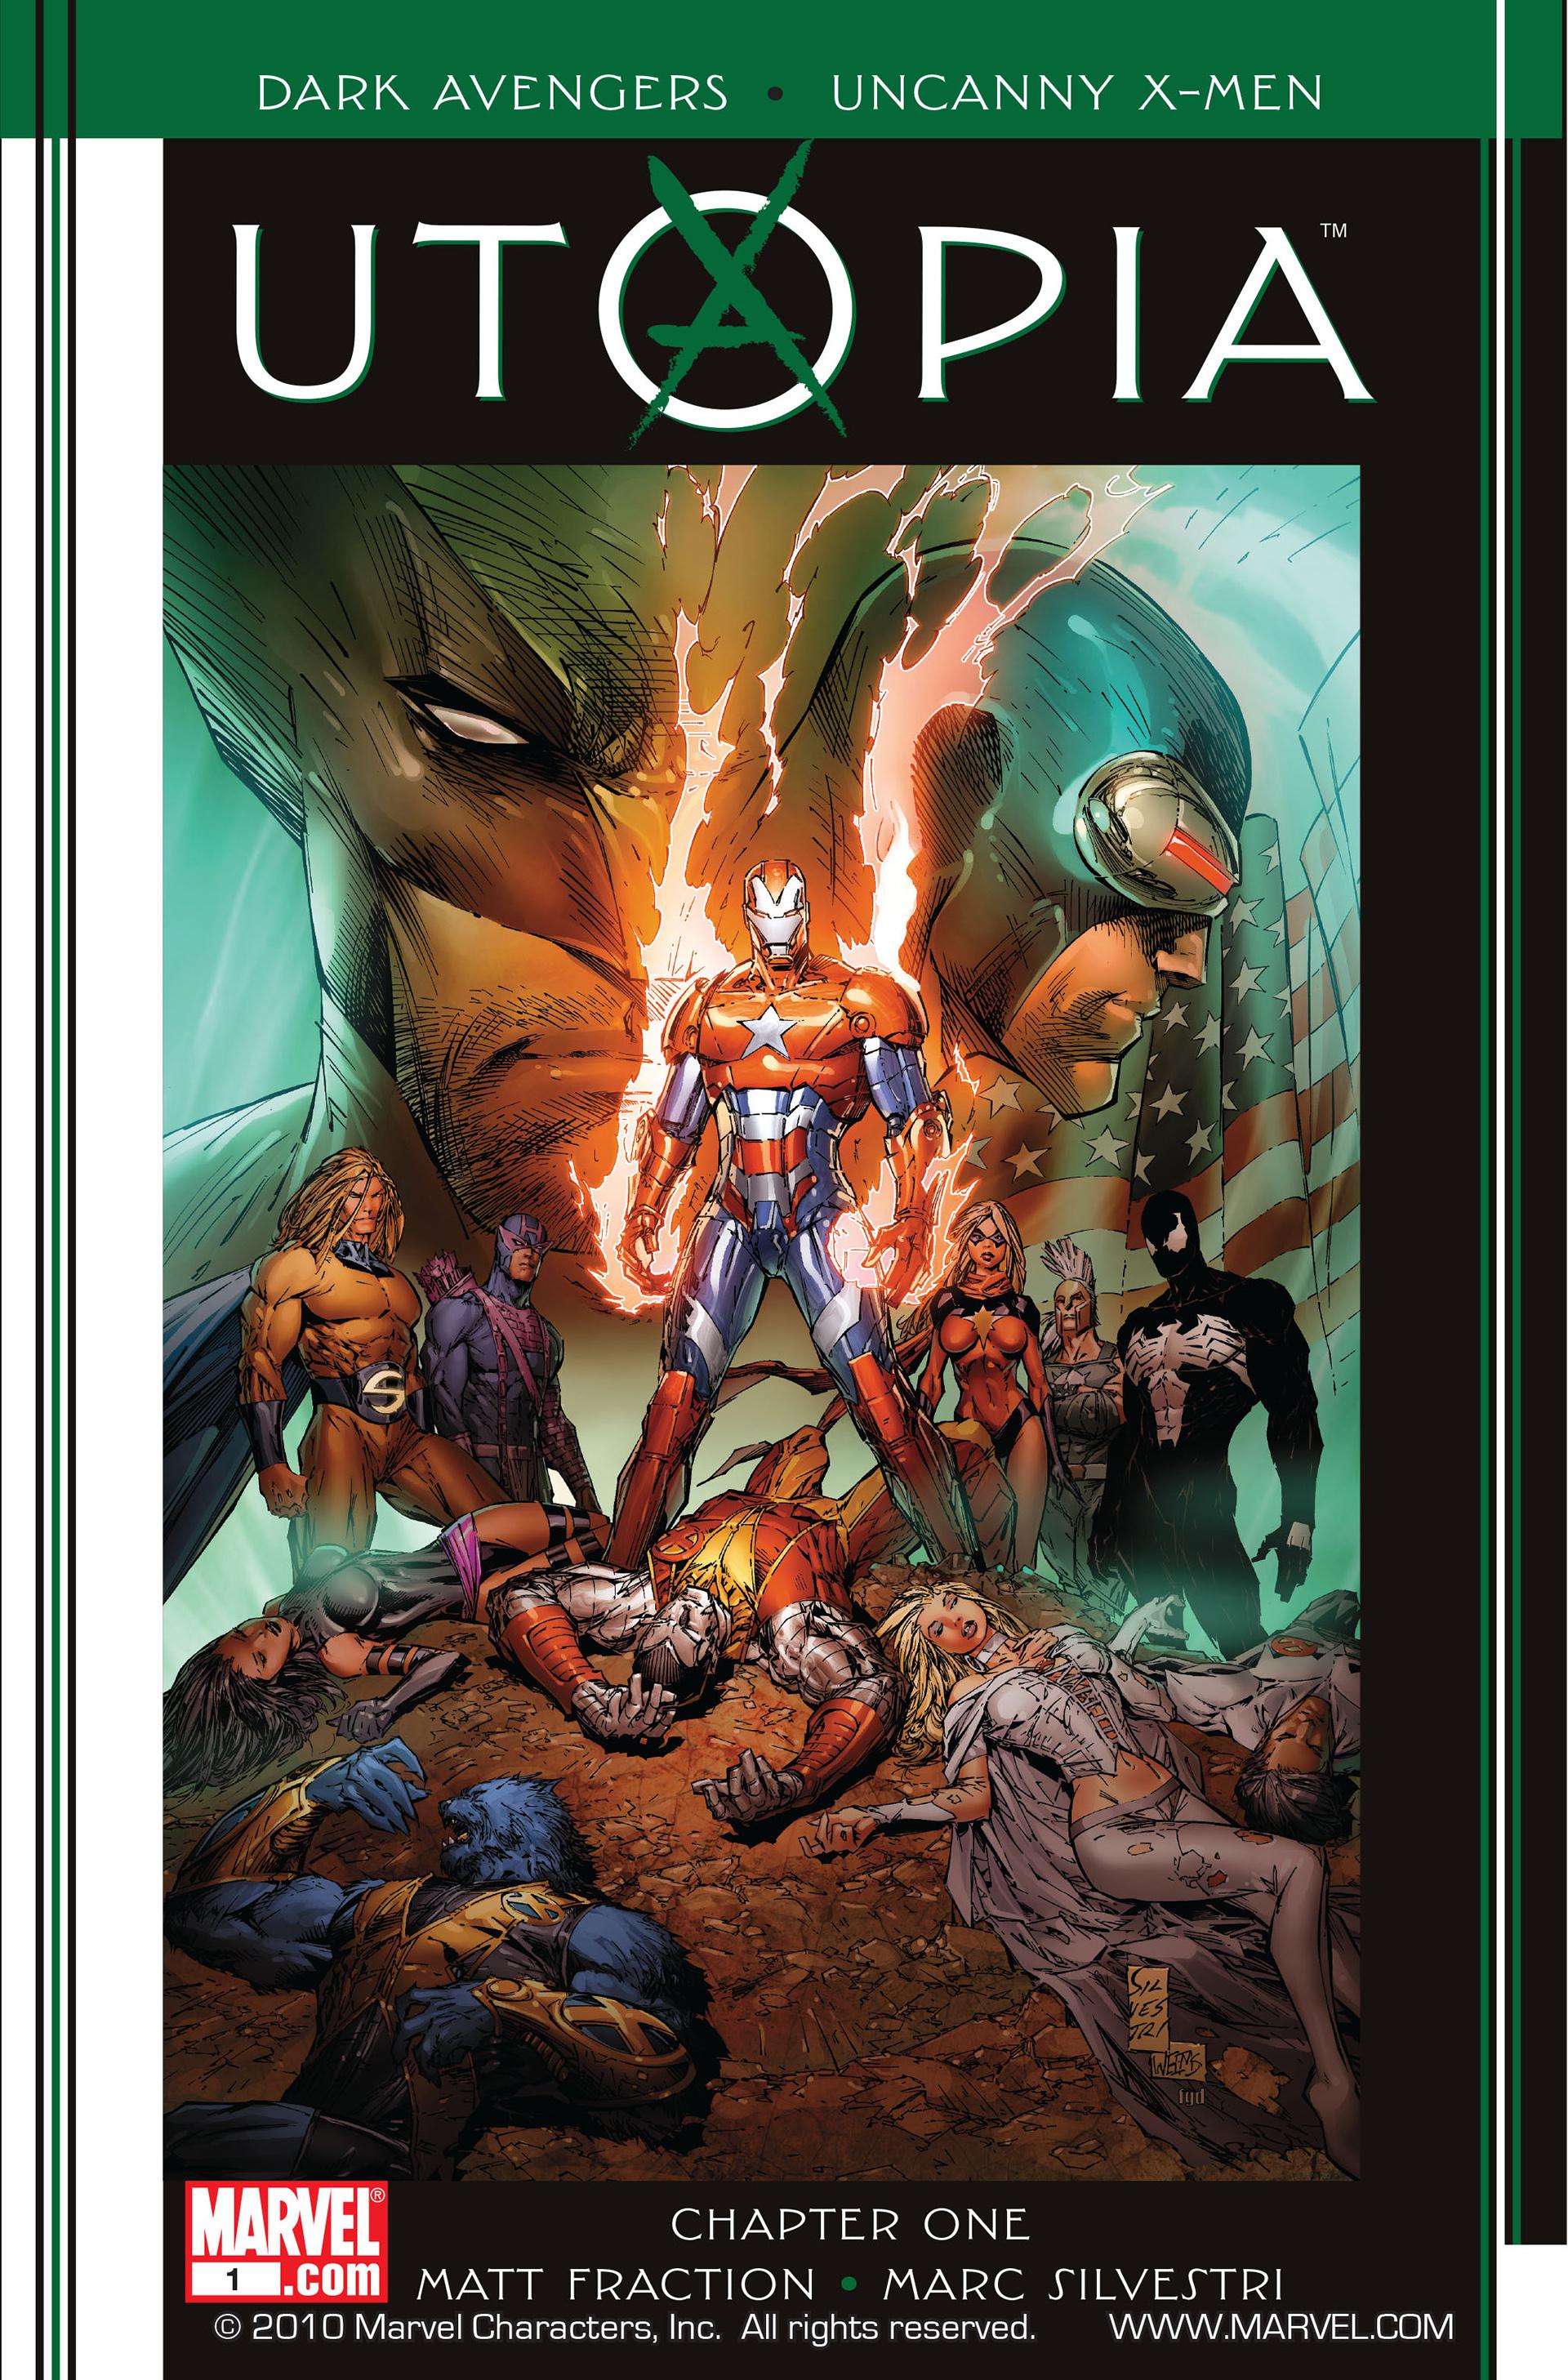 Dark Avengers/Uncanny X-Men: Utopia TPB Page 1